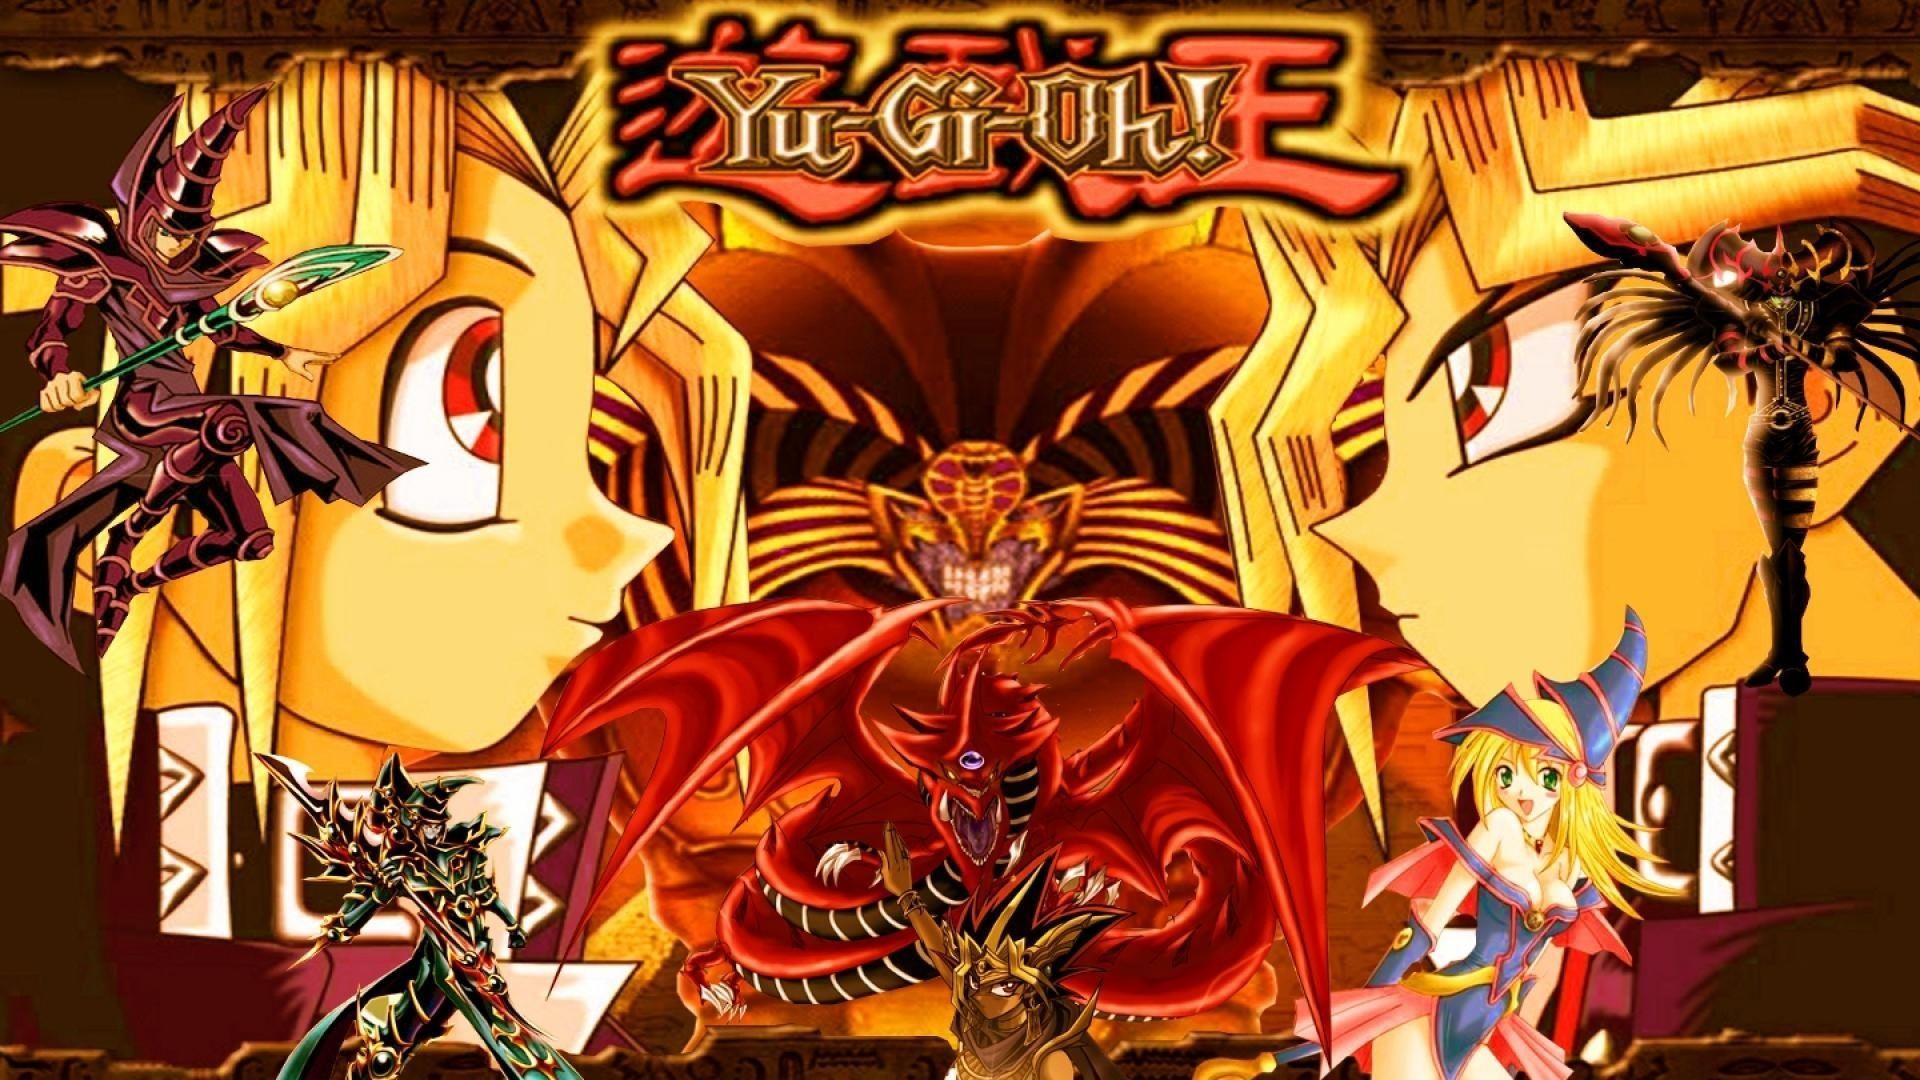 Res 1920x1080 Yugioh Wallpaper Zerochan Anime Image Board Anime Wallpaper Hd Cool Wallpapers Hd Anime Wallpapers